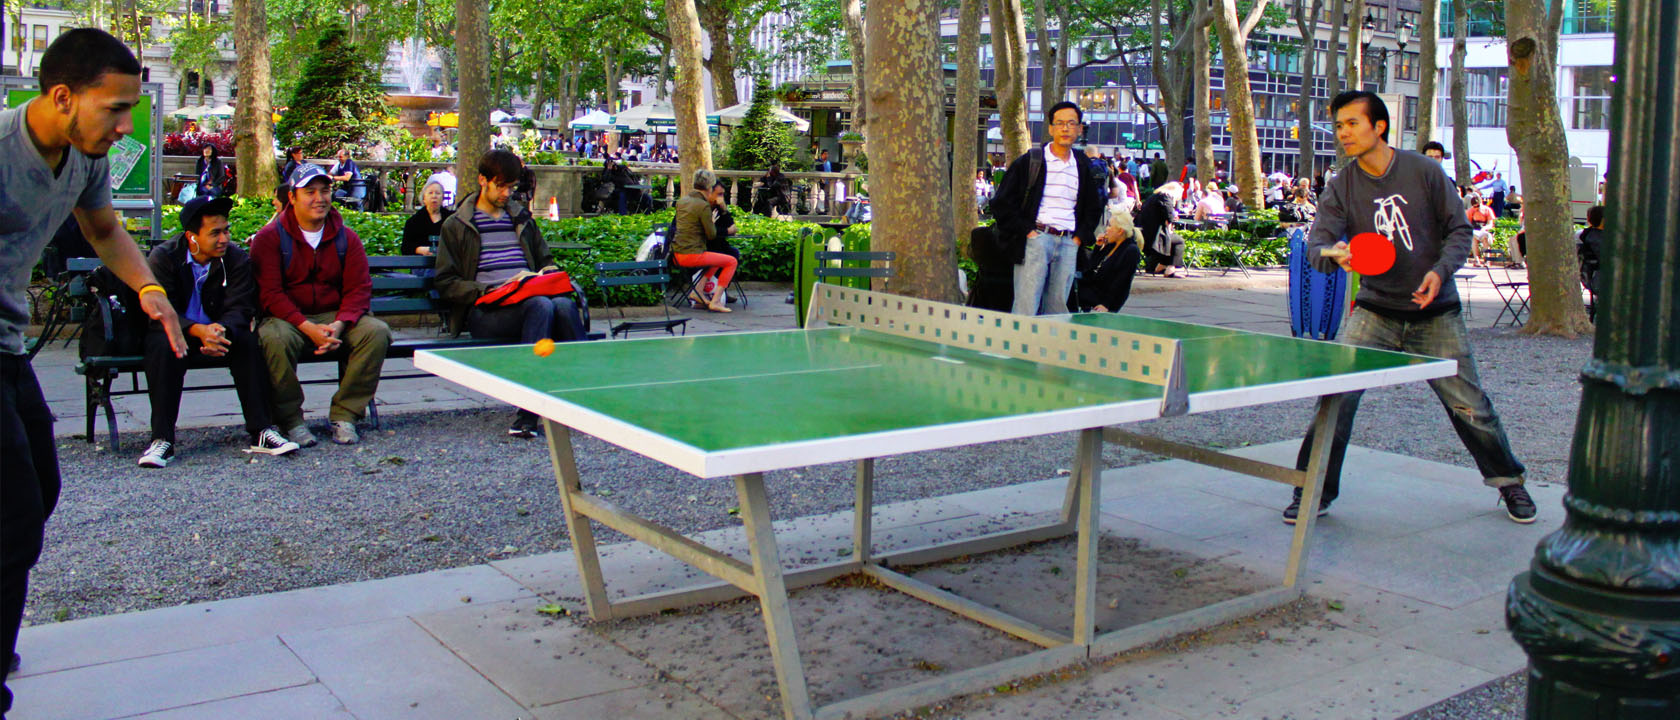 Qu tener en cuenta antes de comprar una mesa de ping pong barata ofertas de mesas de ping pong - Mesa de ping pong precio ...